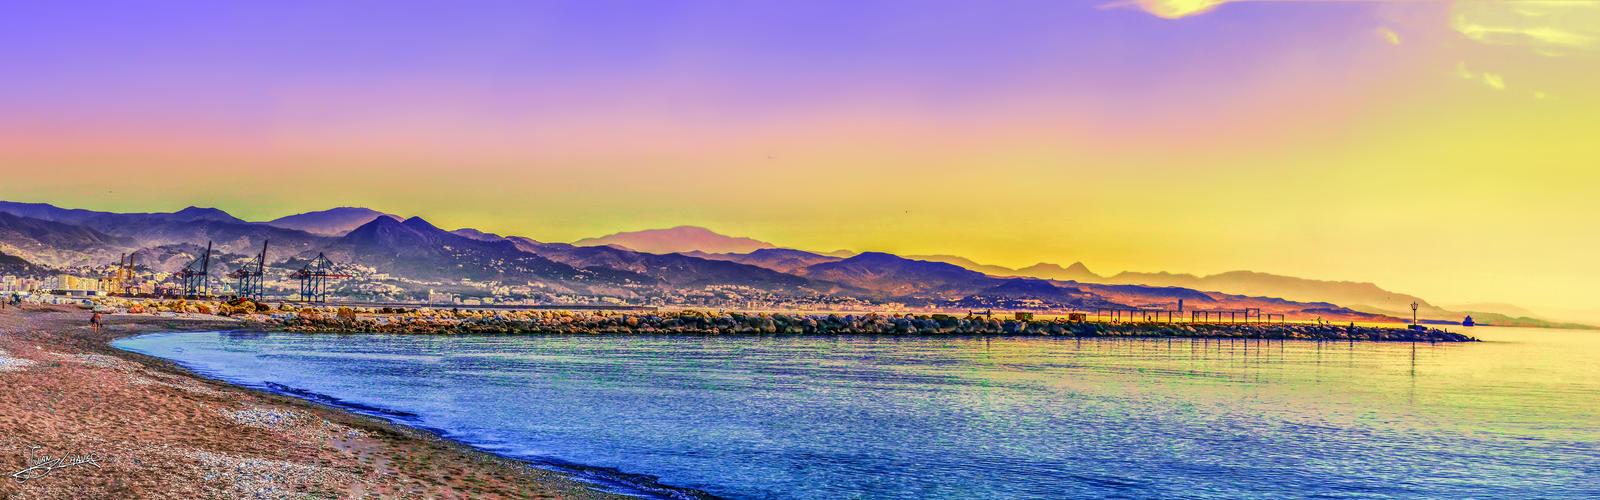 mornings on the coast